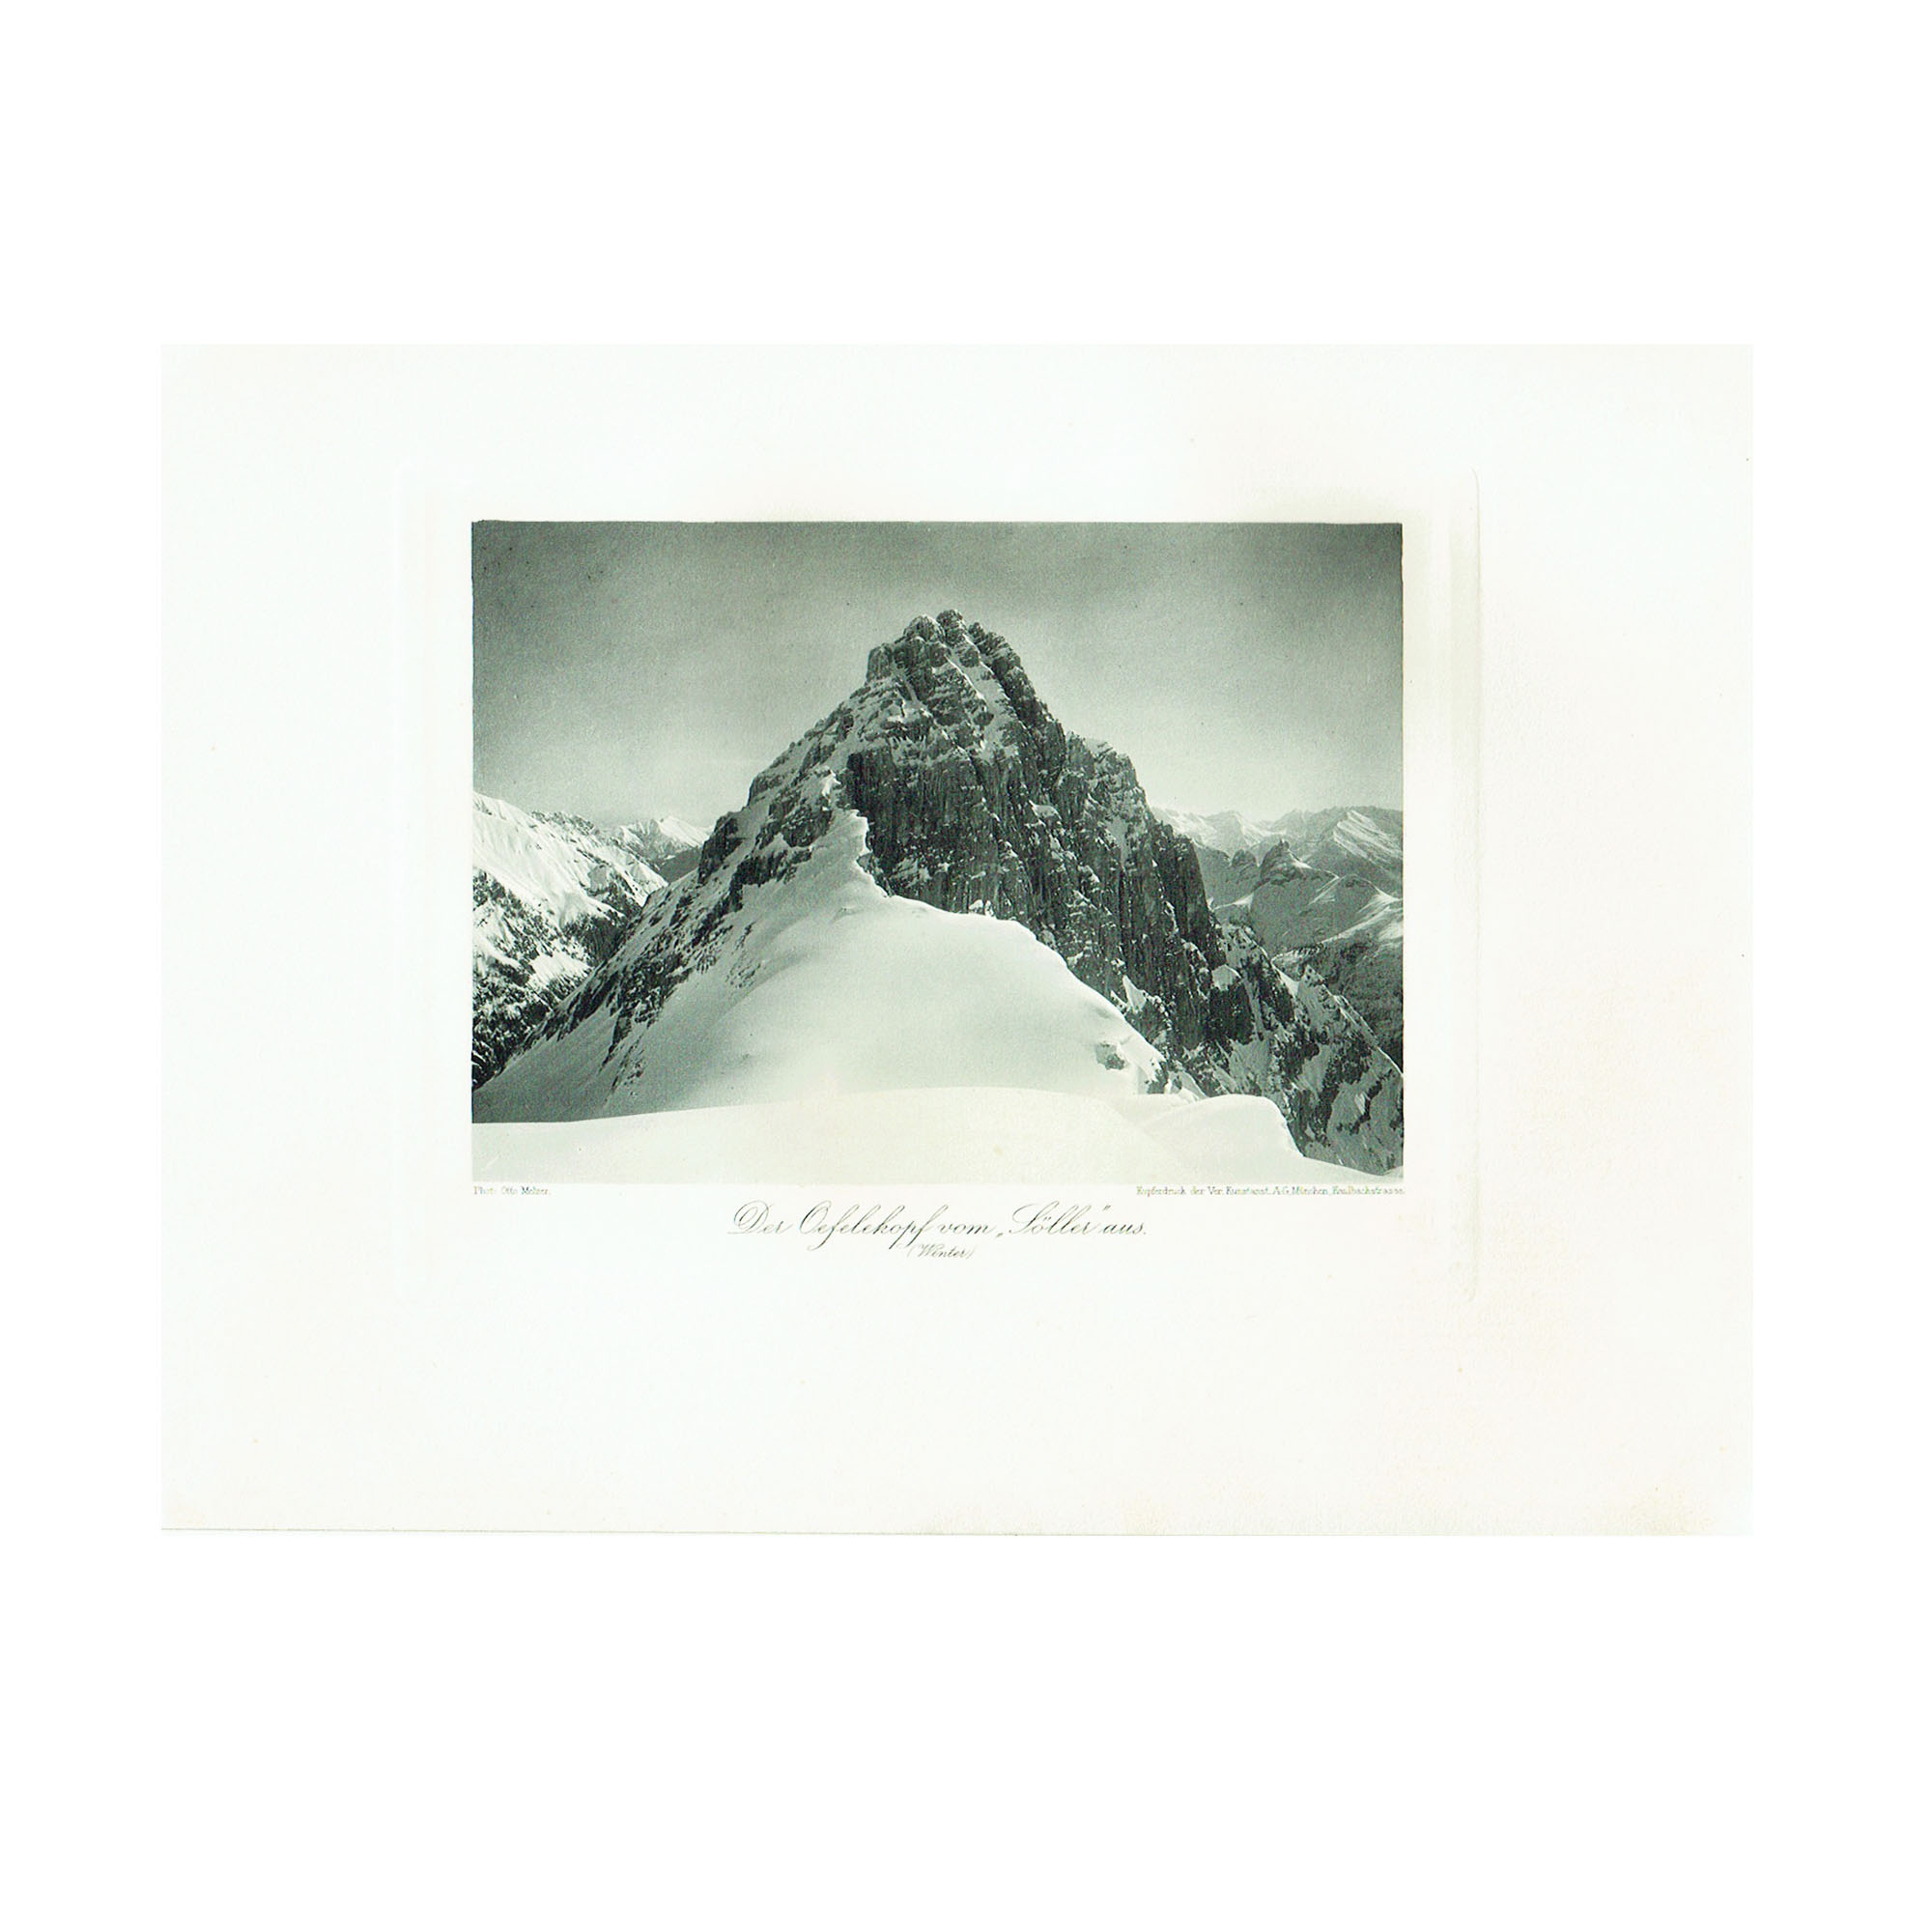 5259-Melzer-Tiroler-Alpenwelt-1905-N.jpeg